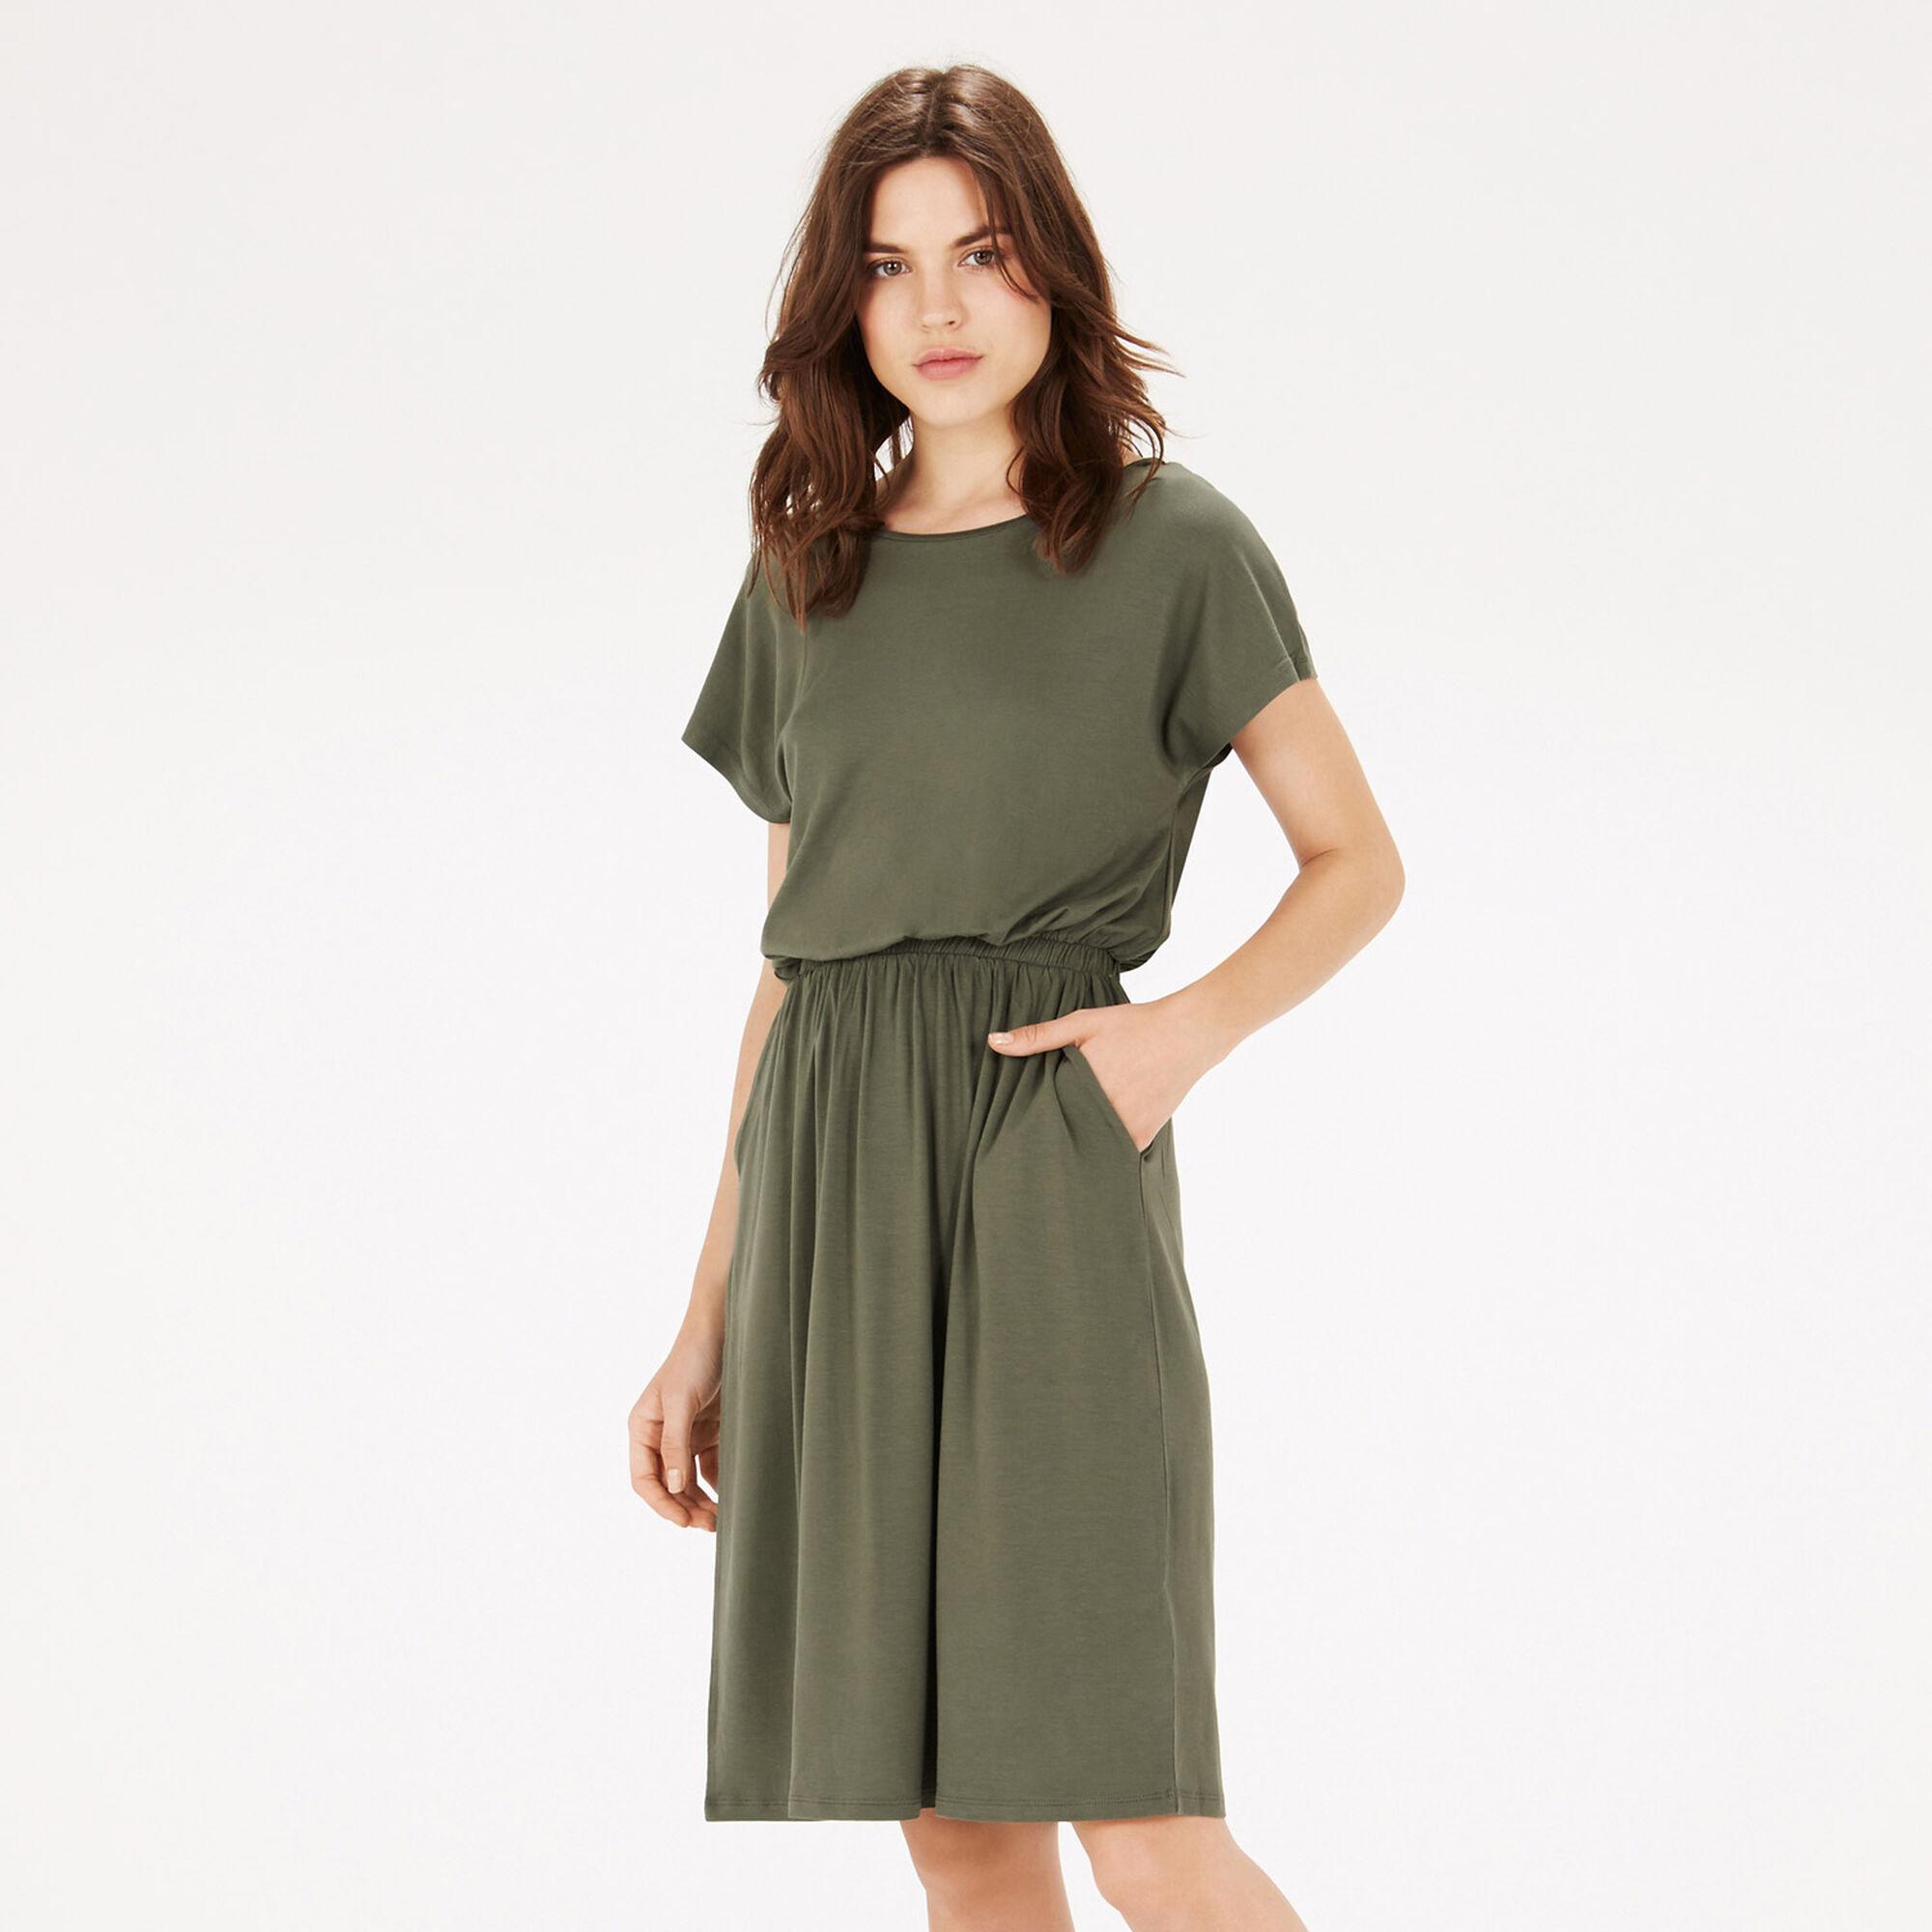 Warehouse, T SHIRT DRESS Khaki 1